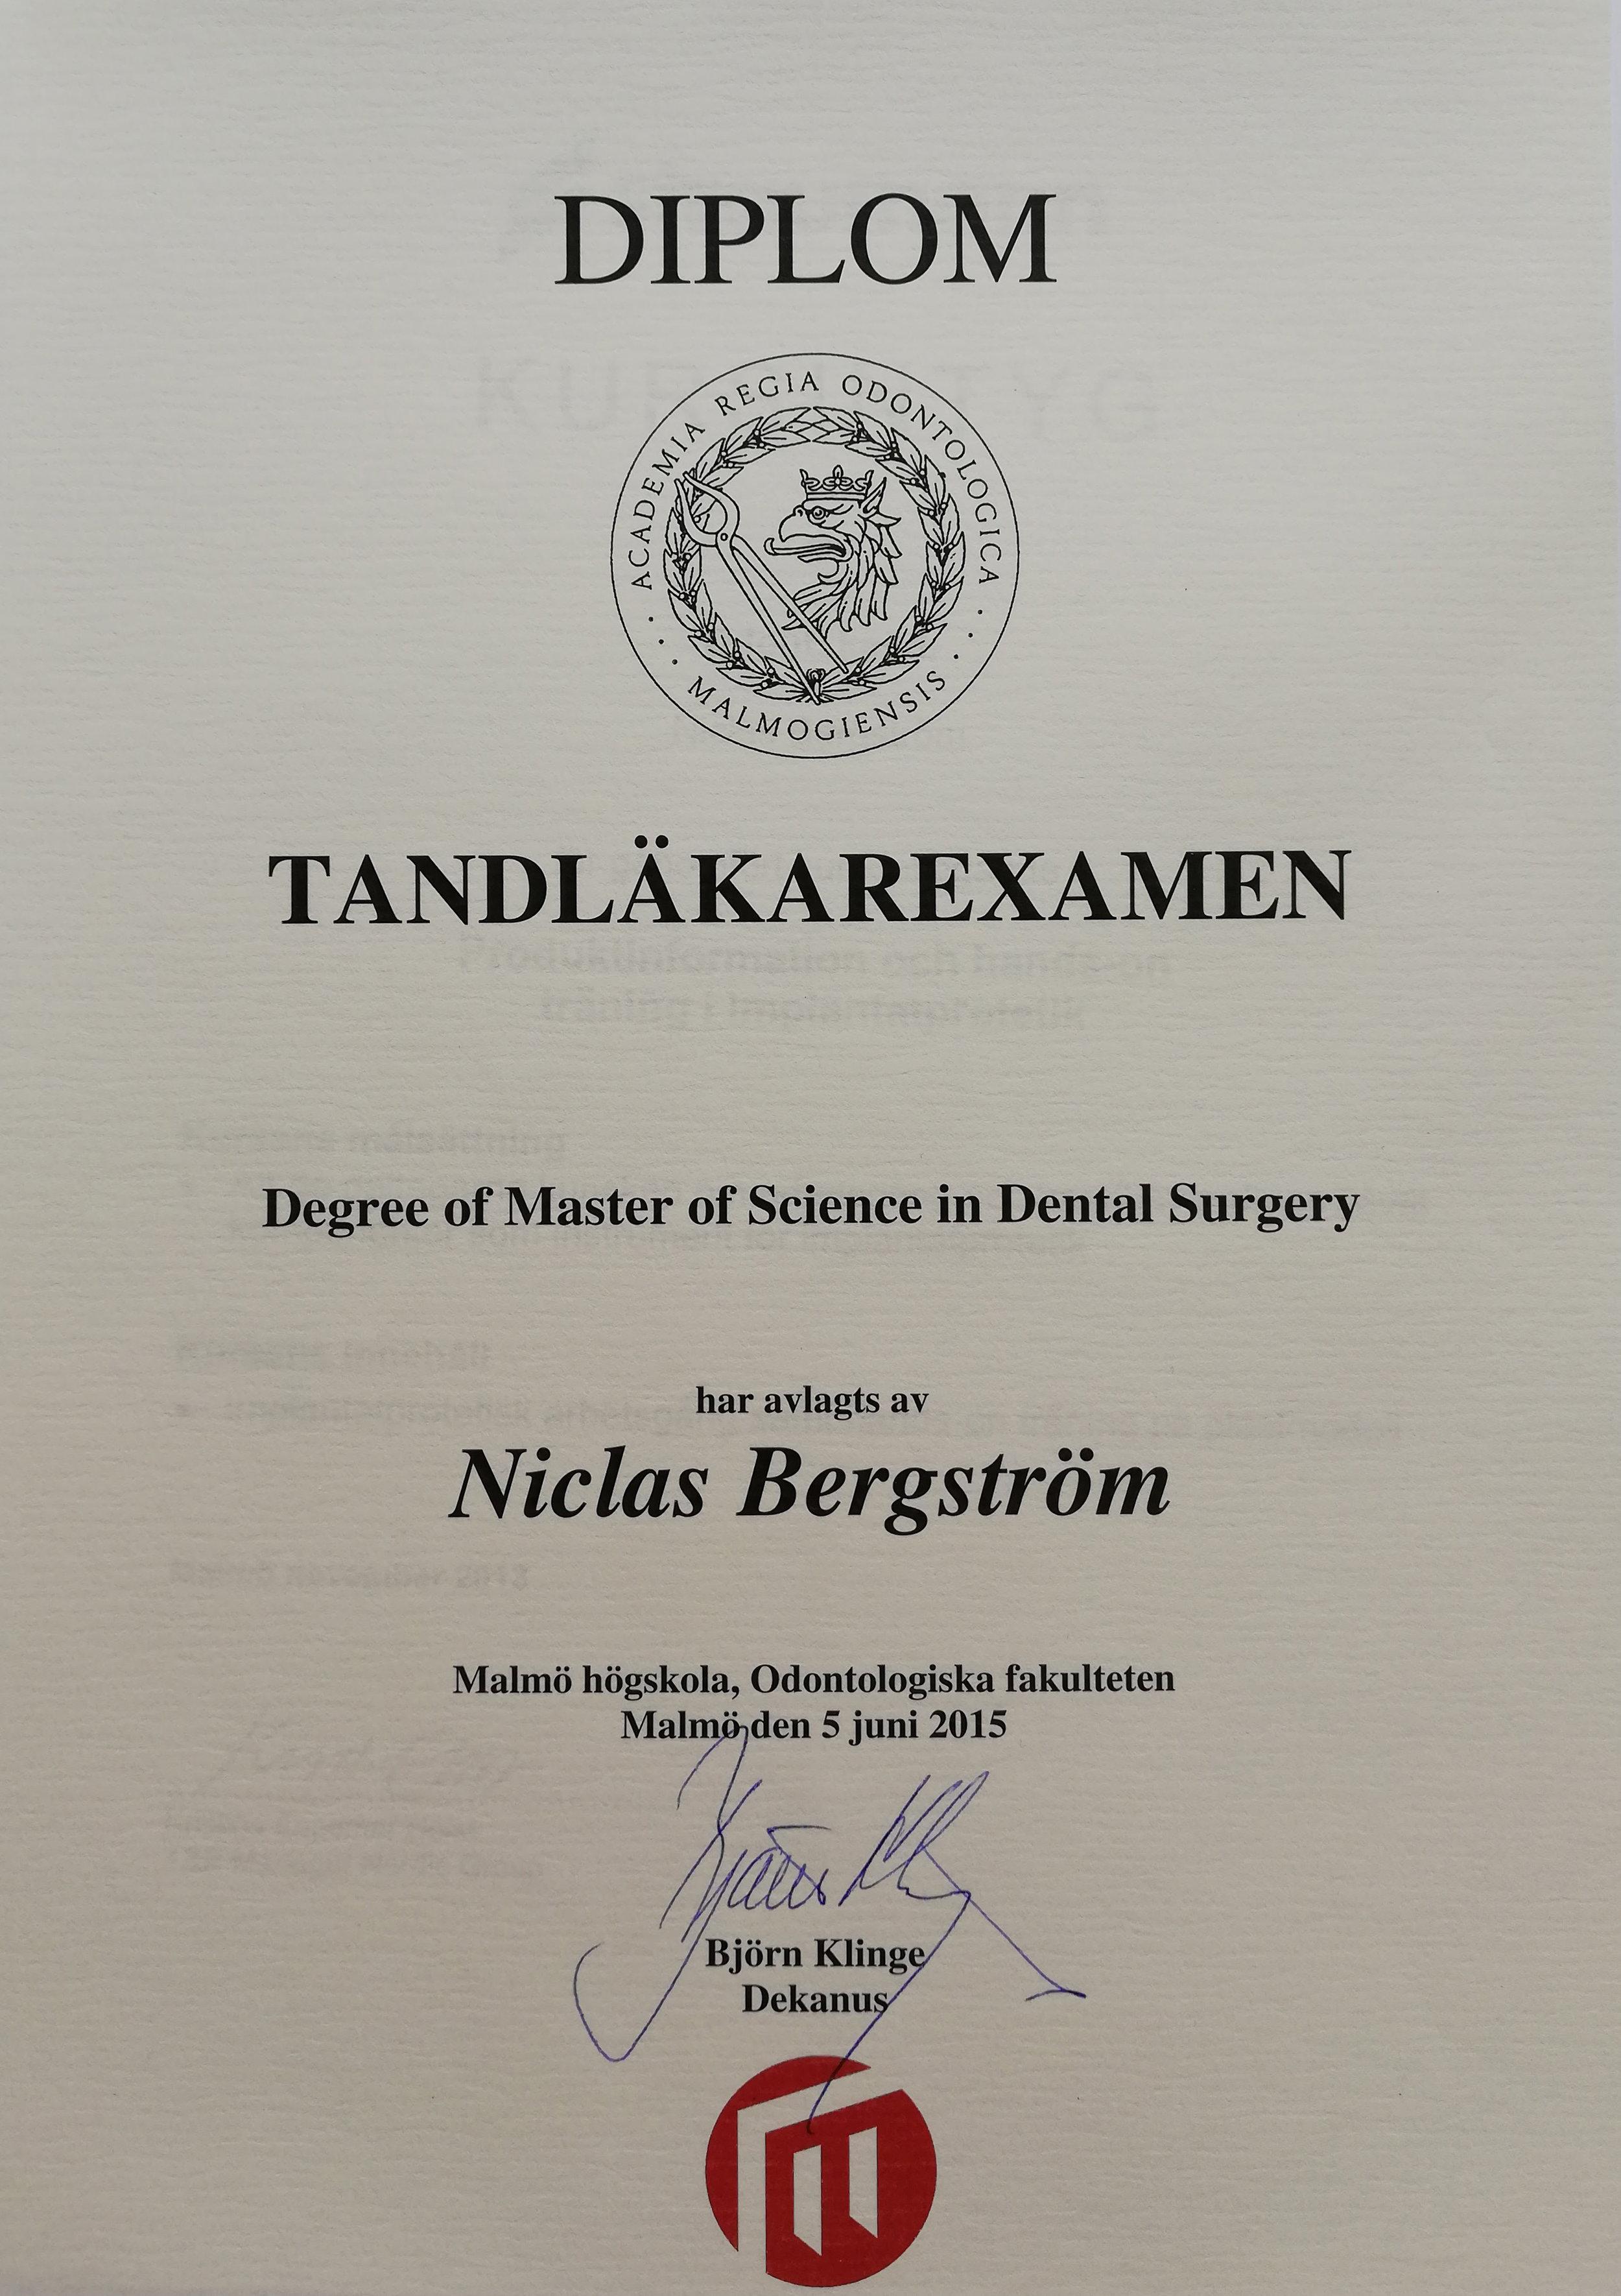 Diplom Tandläkarexamen